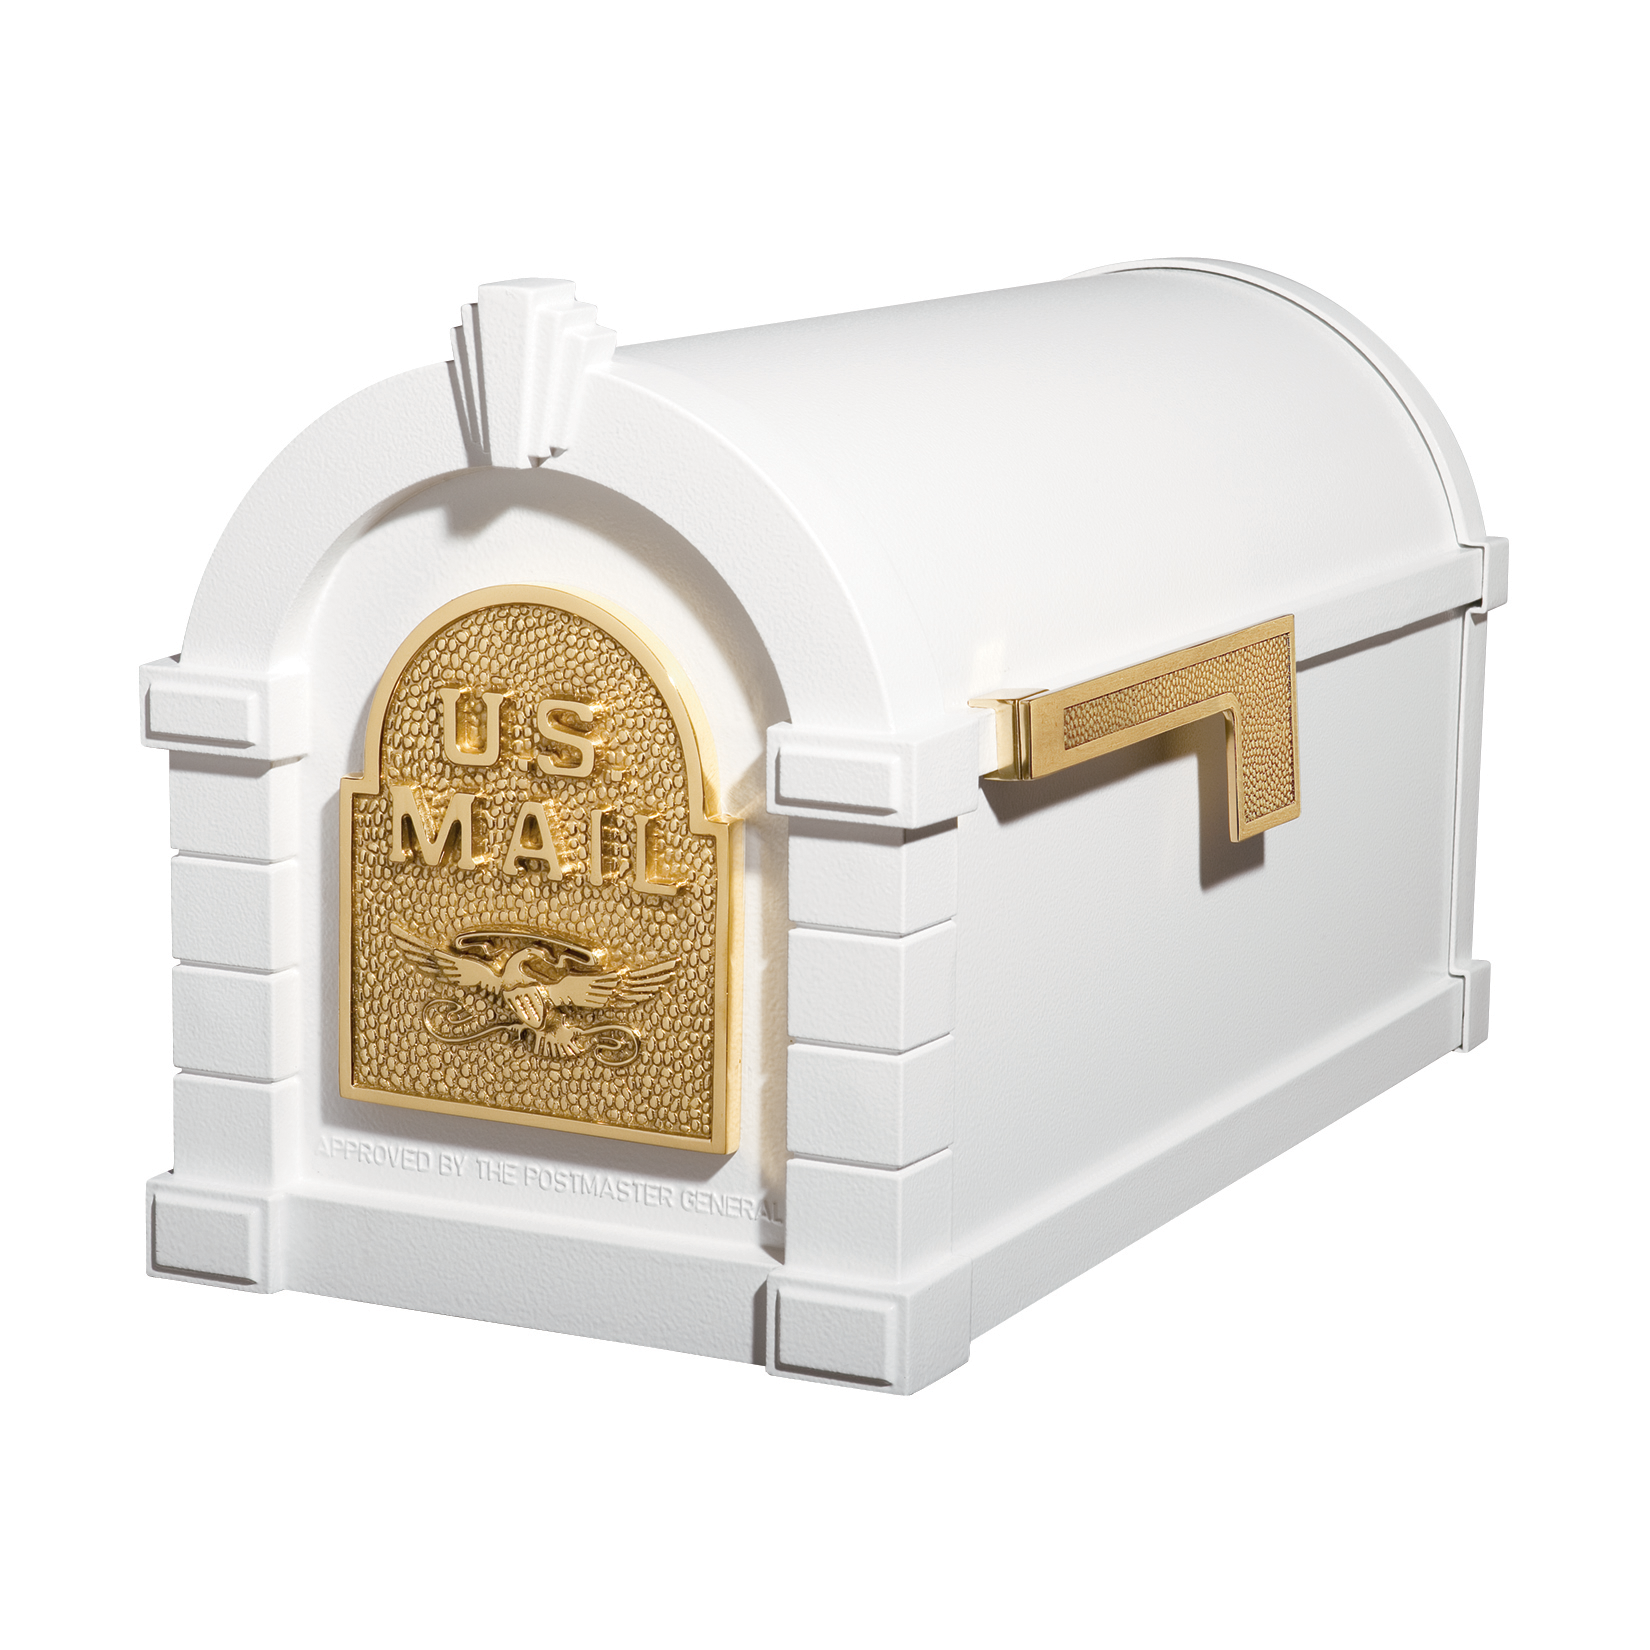 Gaines Eagle Keystone MailboxesWhite with Polished Brass